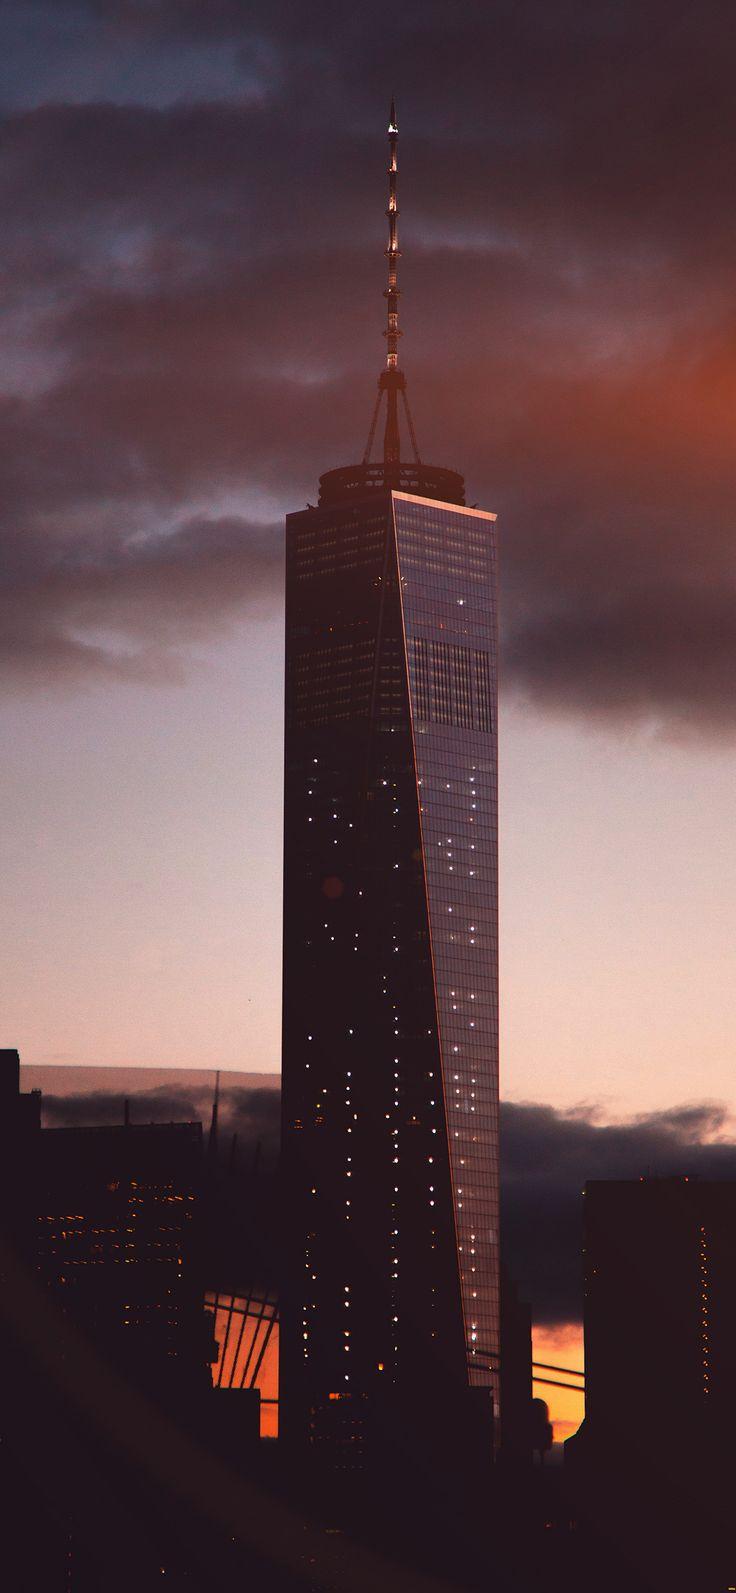 Iphone X Wallpaper Nc36 City Tower Skyline Night Flare Via